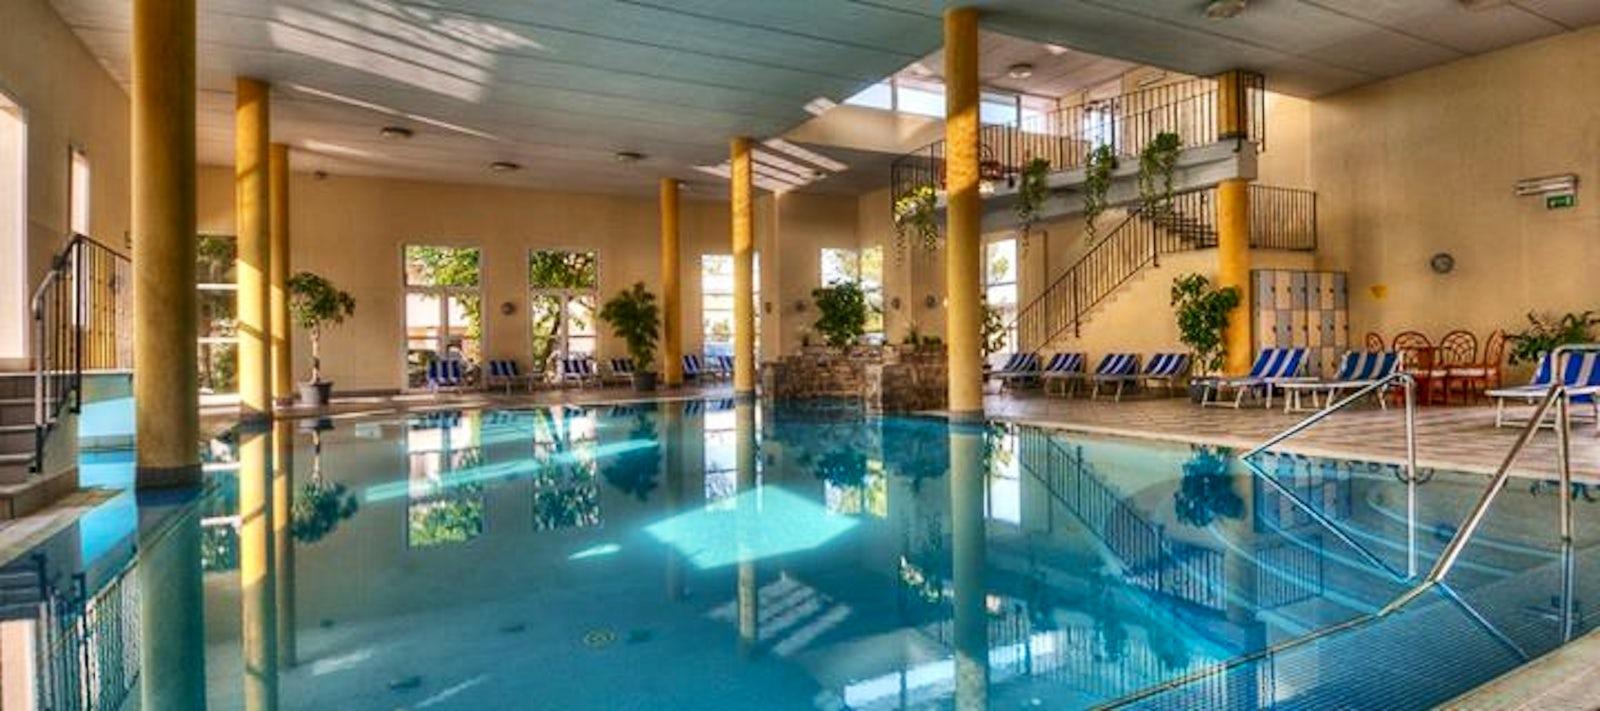 Travel inspired - Location - Hotel Terme Belsoggiorno | itinari